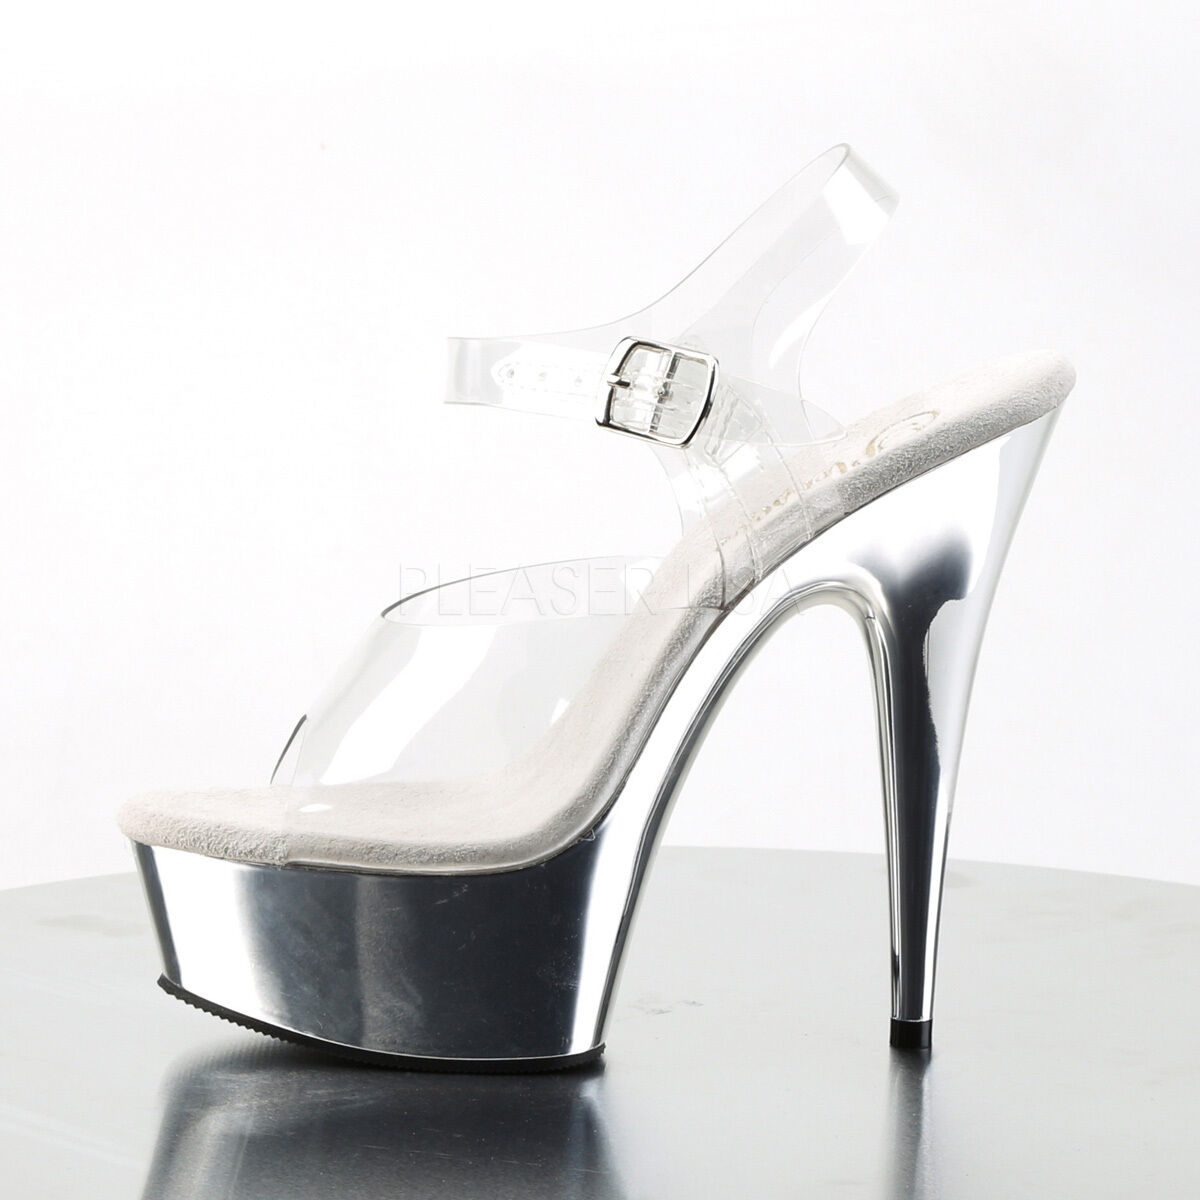 PLEASER Sexy Exotic Stripper argent Platform Ankle Strap 6    High Heels chaussures f33902